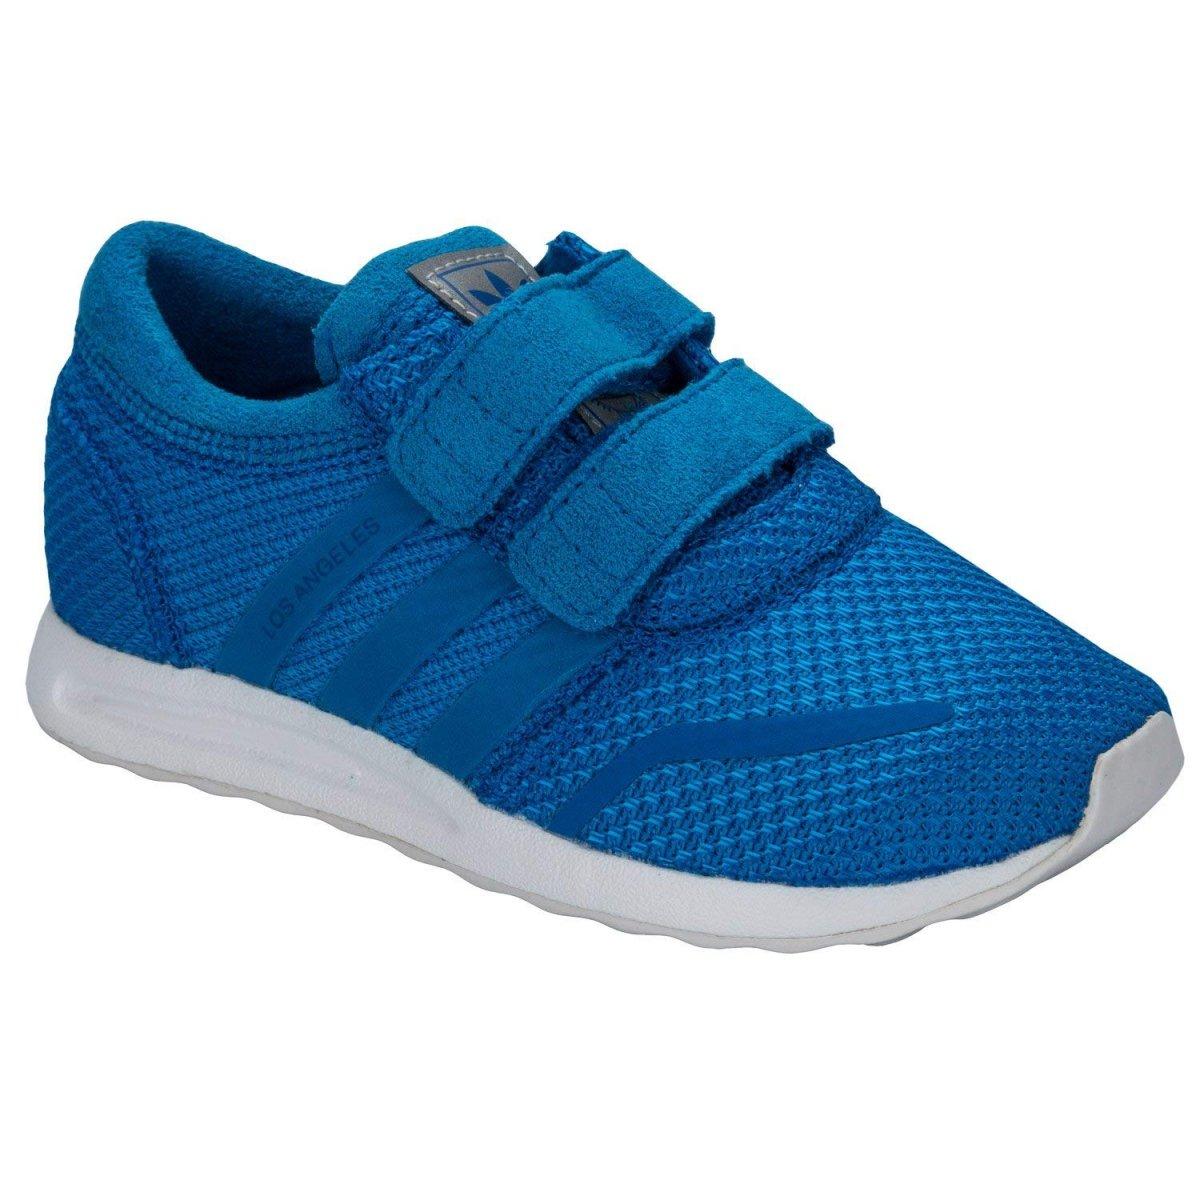 Wysoka jako?? buty Buty Adidas Originals Los Angeles Jr